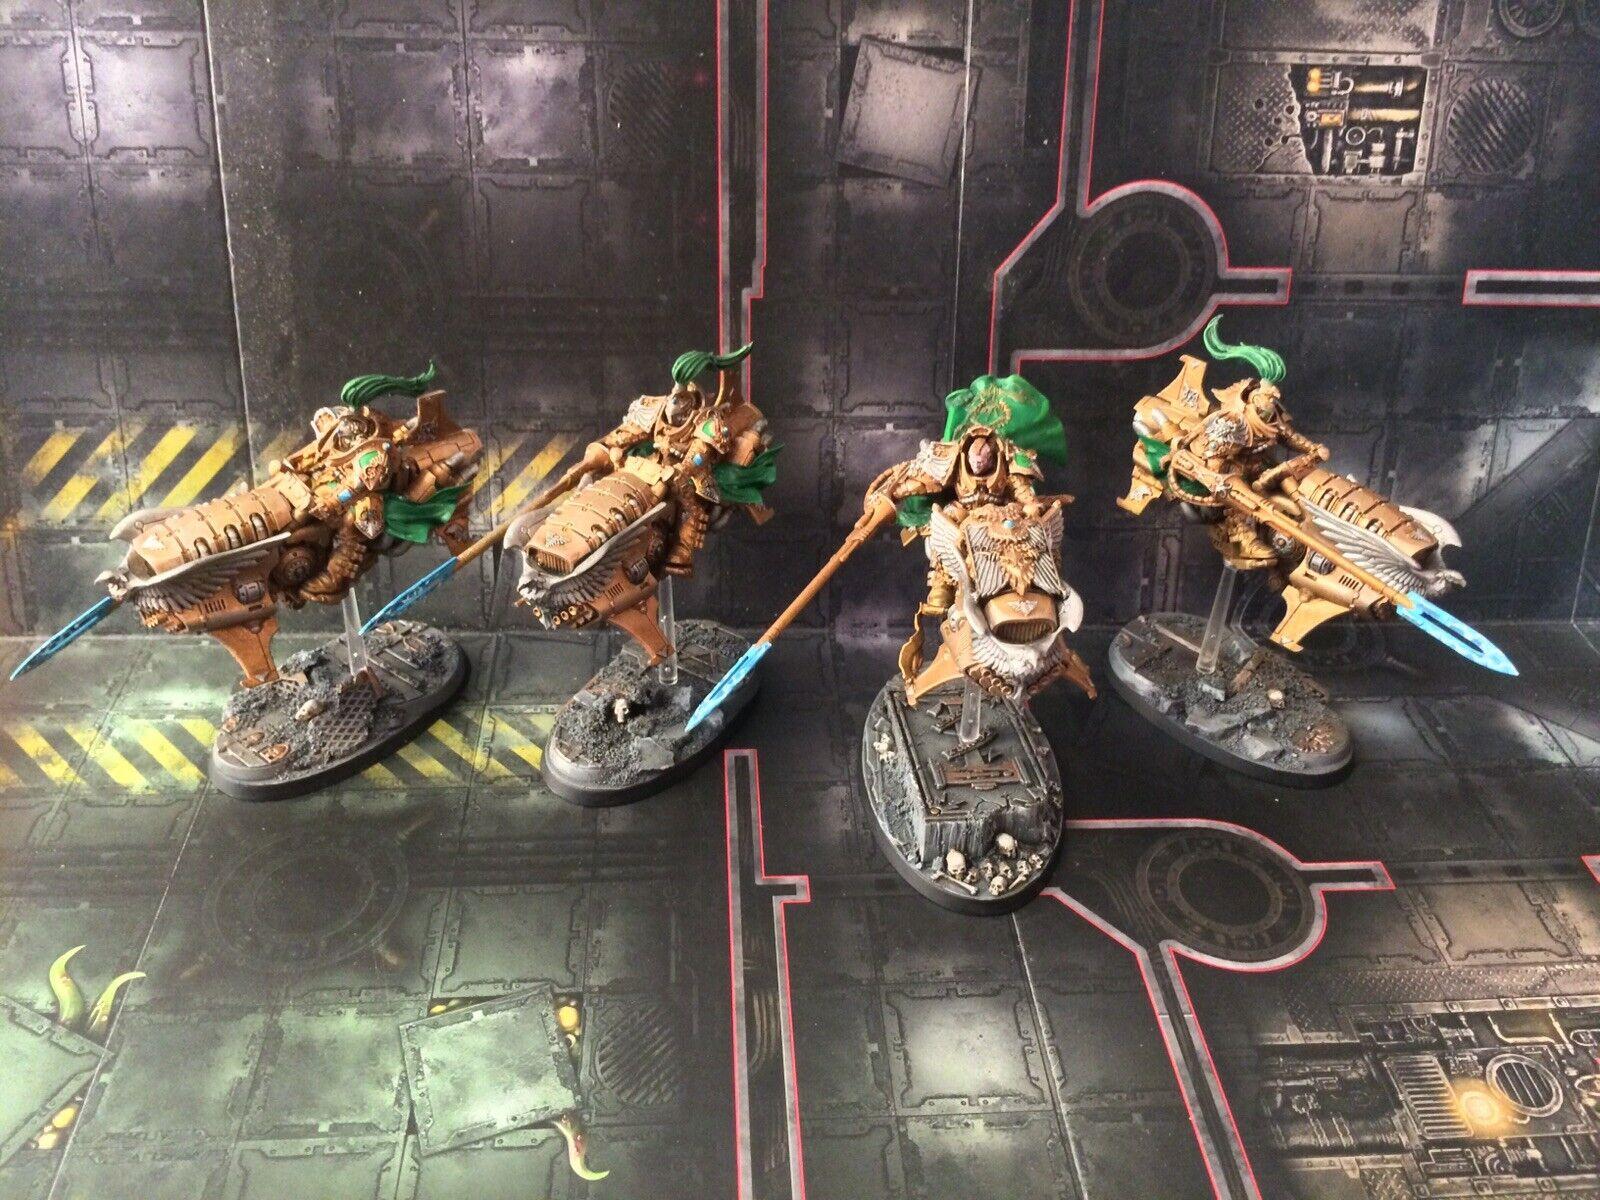 Warhammer 40k  Adeptus Custodes Jetbikes + vexilla +shield  captain COMMISSION  servizio premuroso